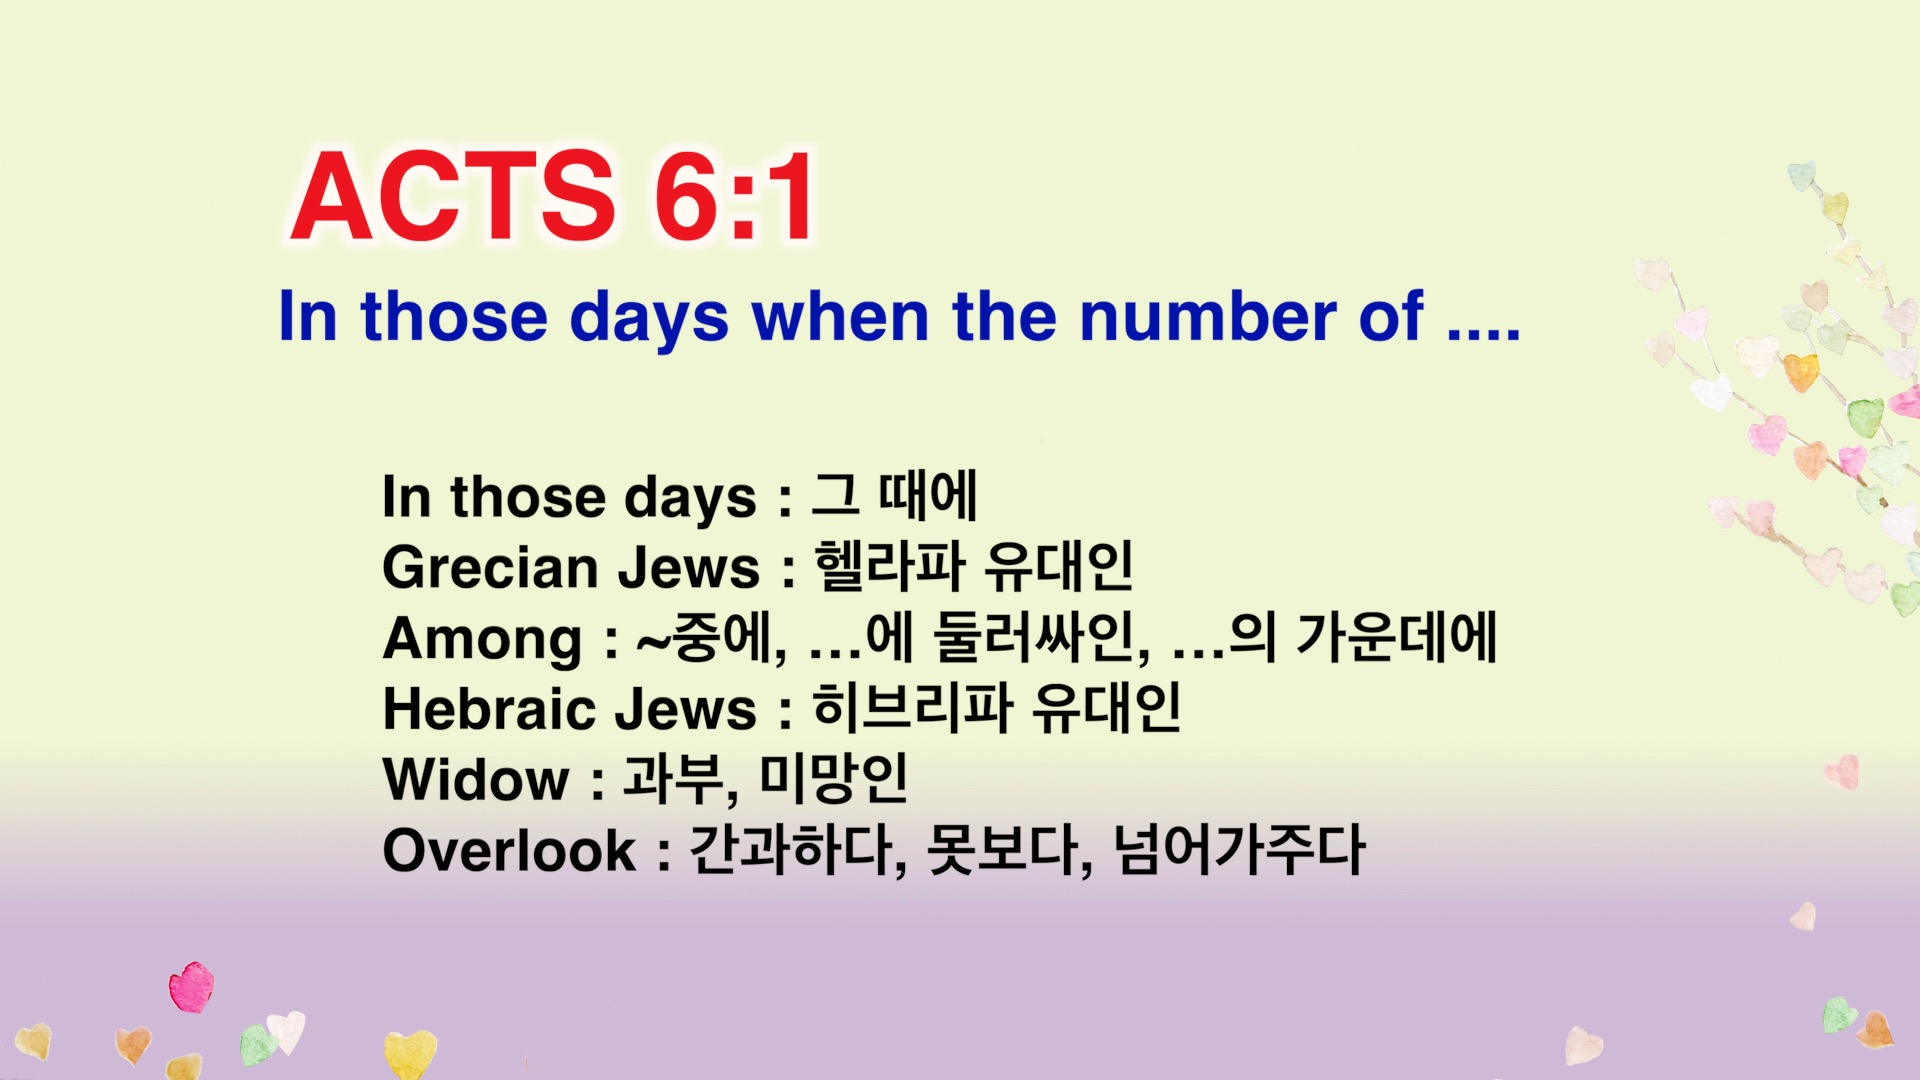 Leena's Bible English-Acts Chap. 6, Ver.1